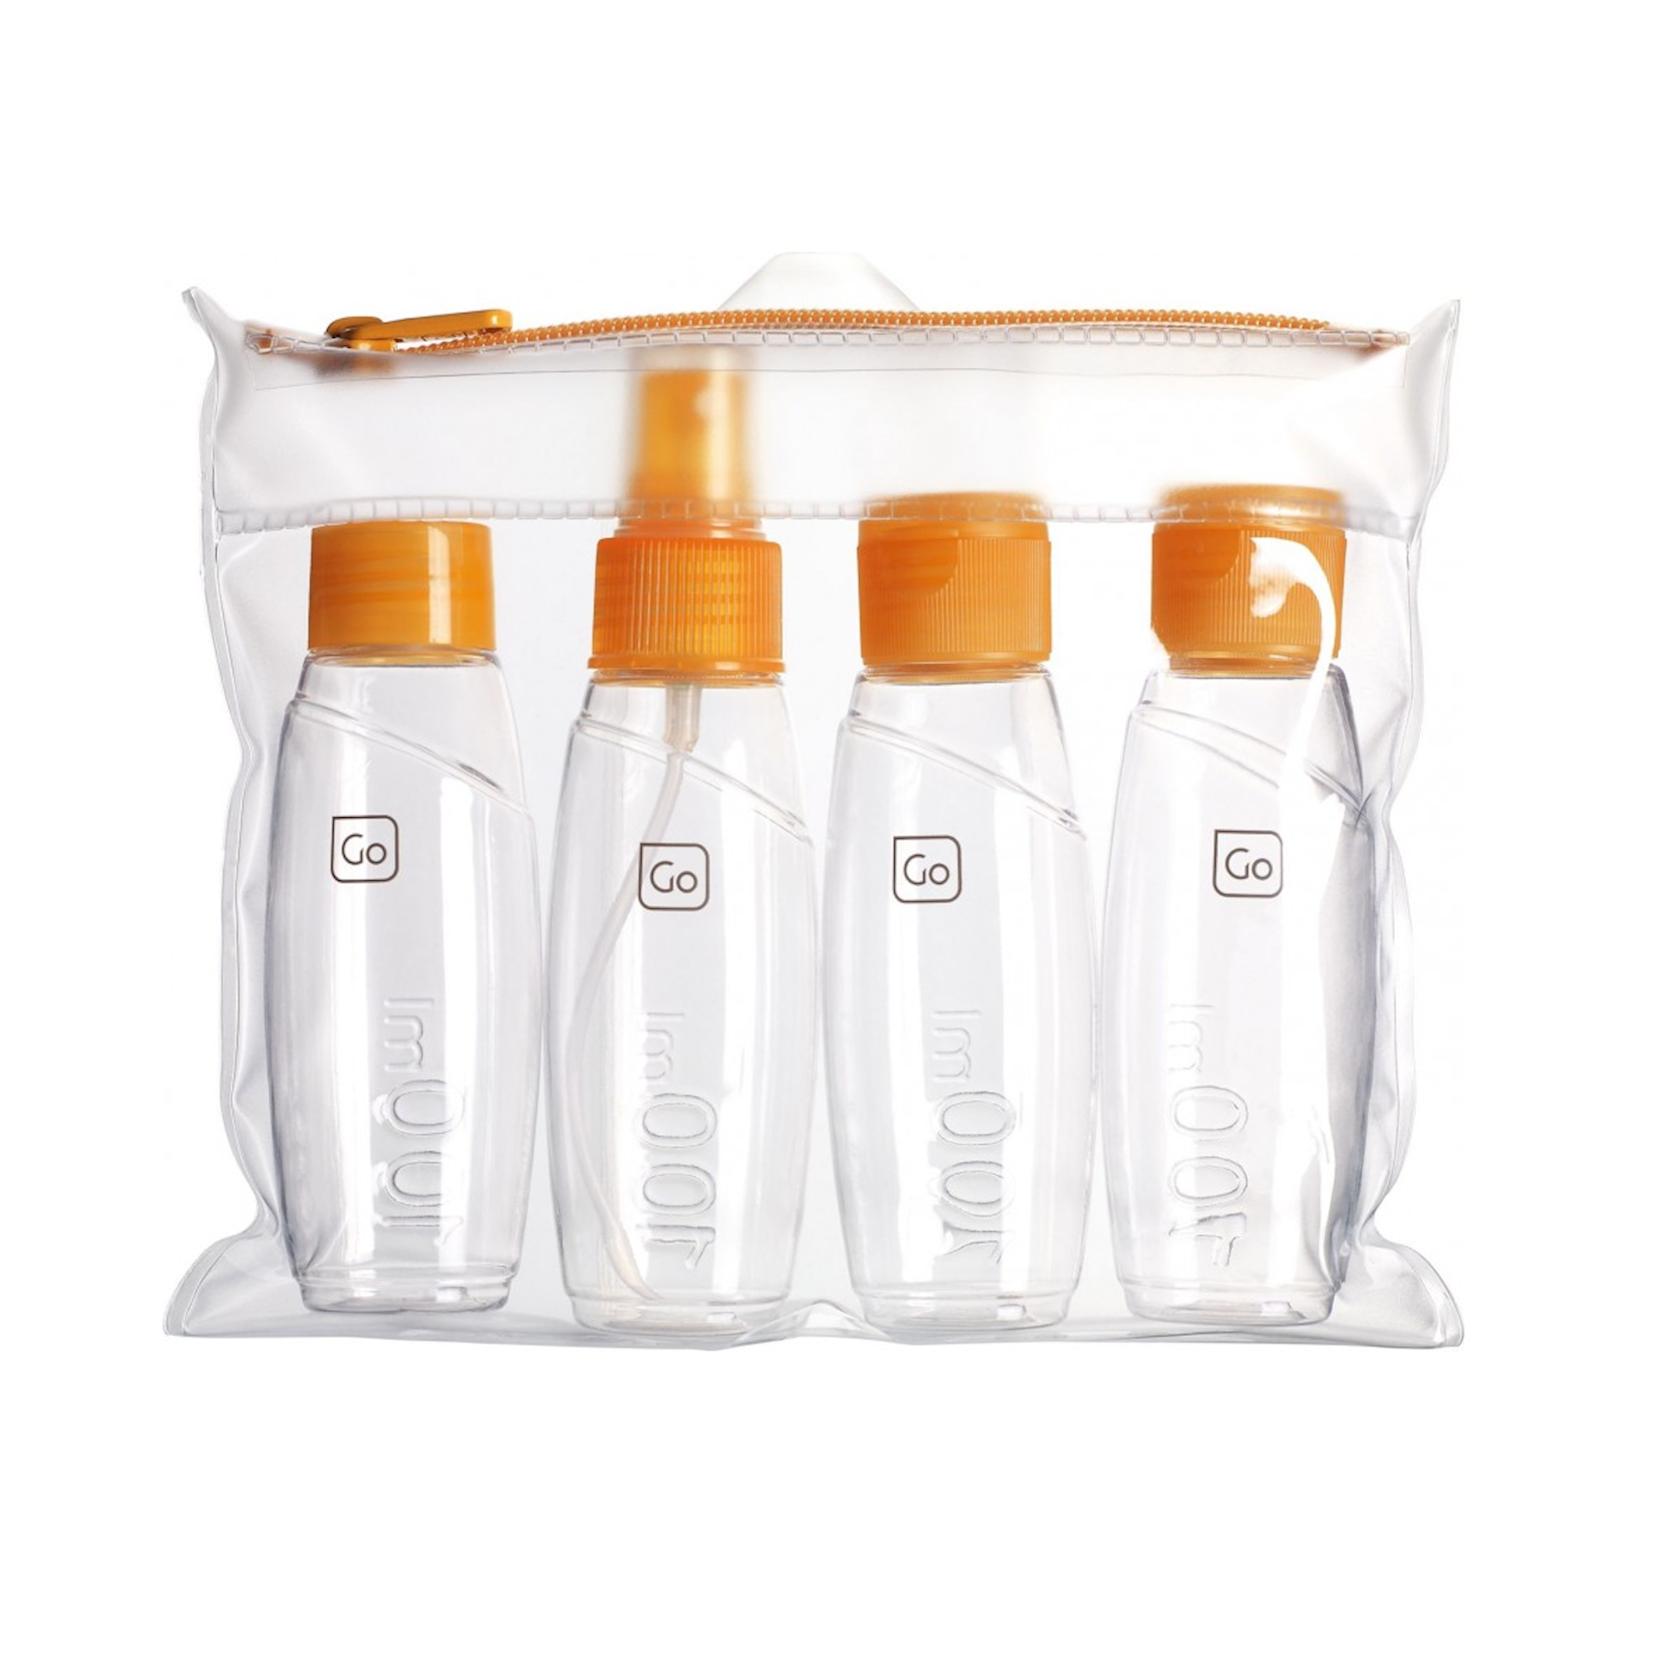 Dəst Go Travel TSA Approved Cabin Bottles Set Travel Accessory 658